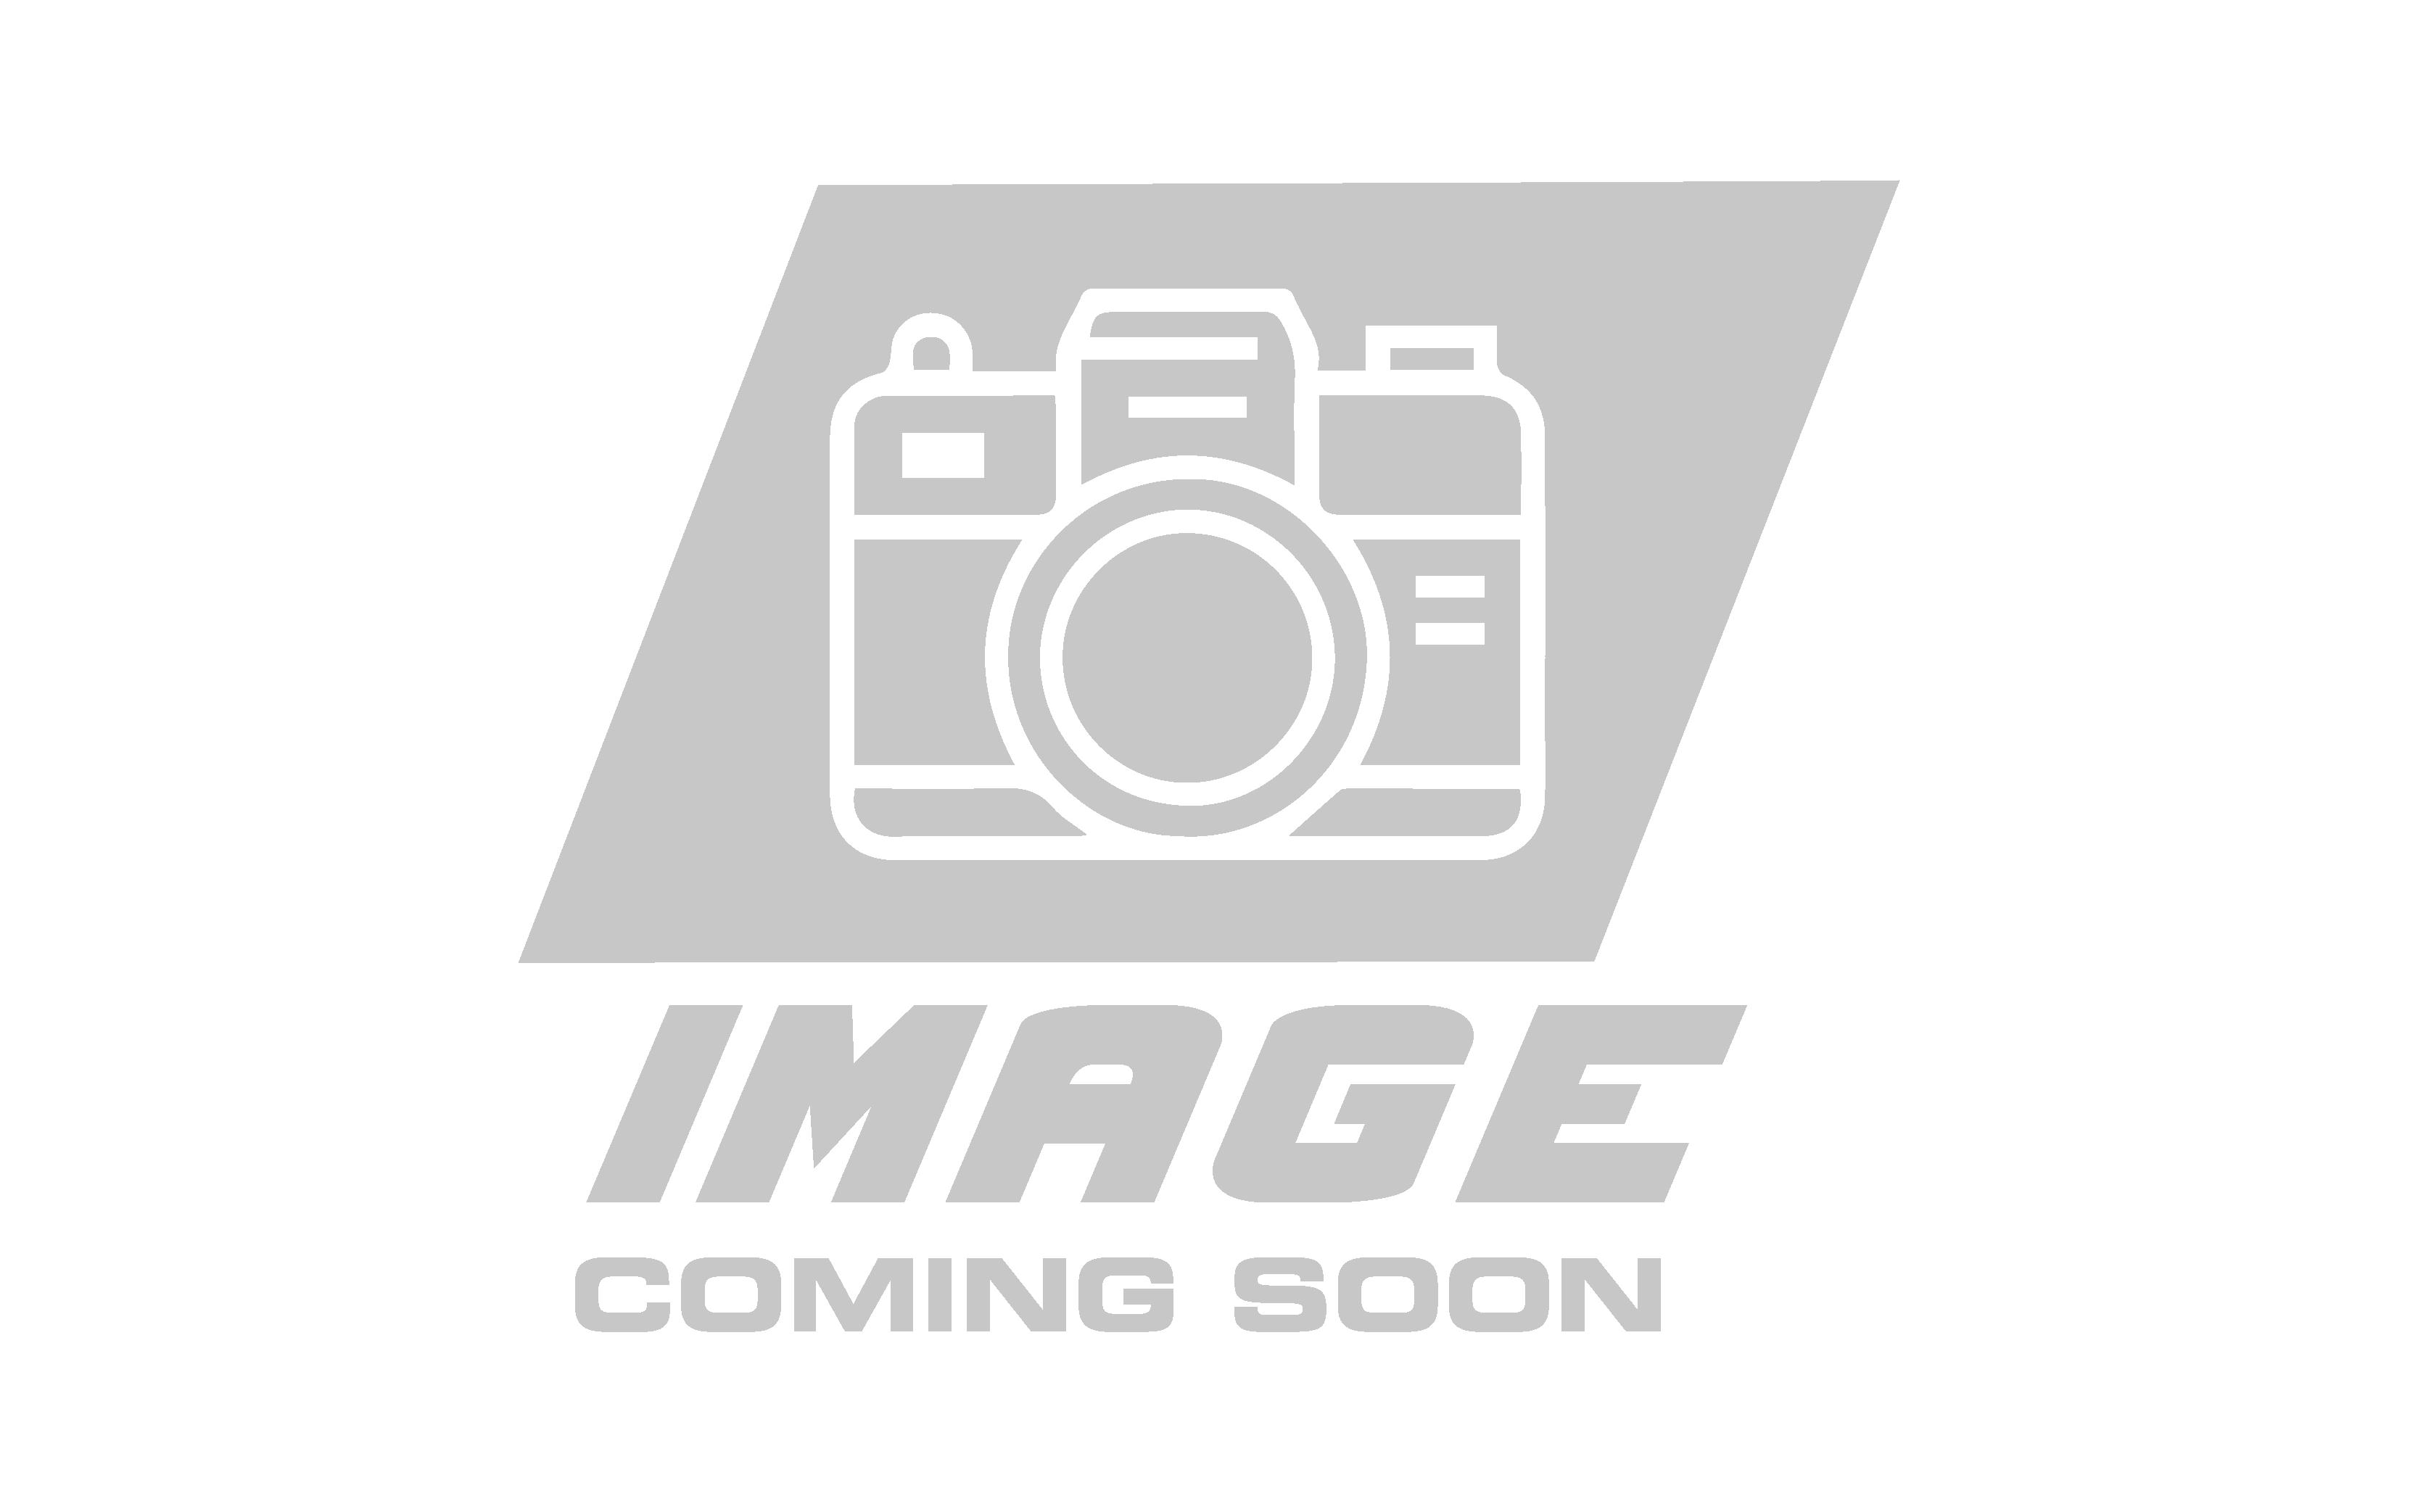 ford_f250_f350_1st_gen_air_lift_loadlifter_5000_ultimate_bag_88393